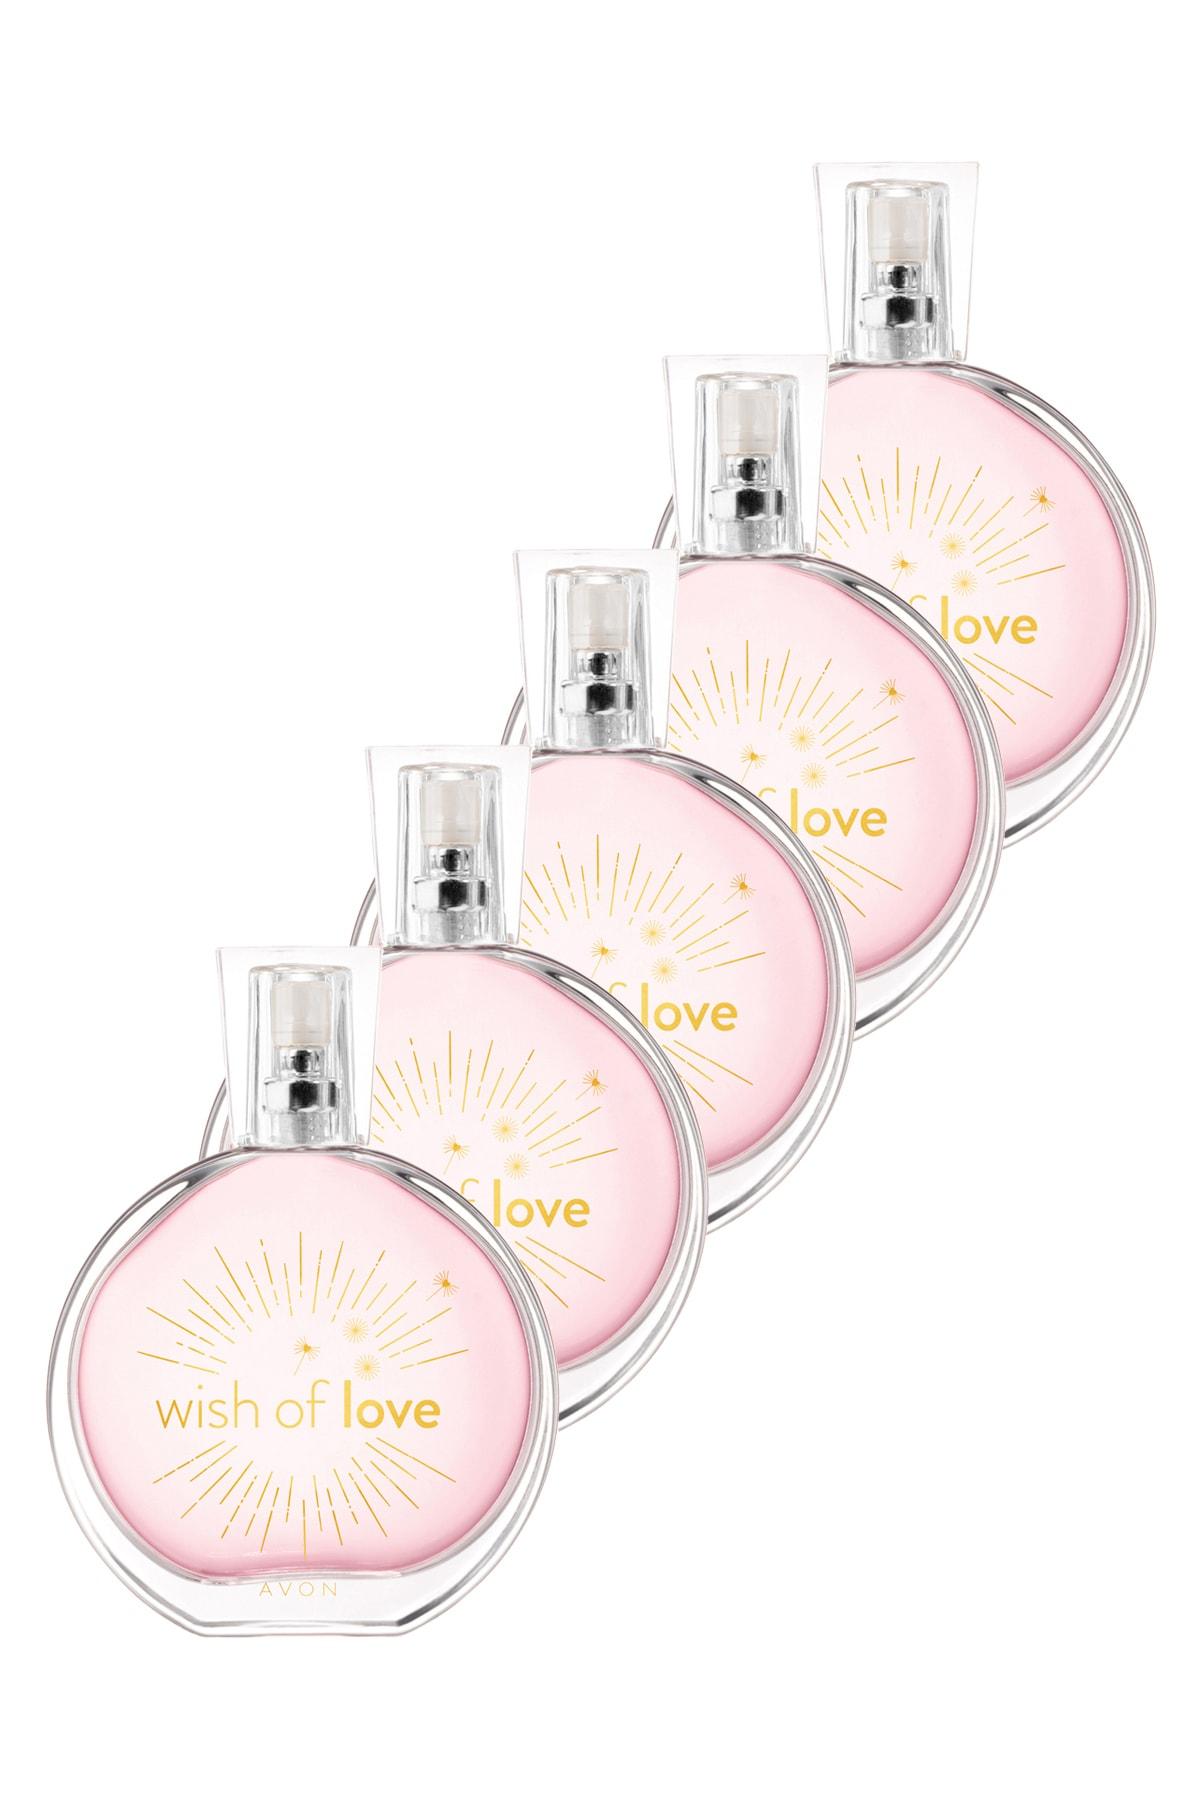 AVON Wish Of Love Kadın Parfüm Edt 50 ml 5'li Set 5050000103398